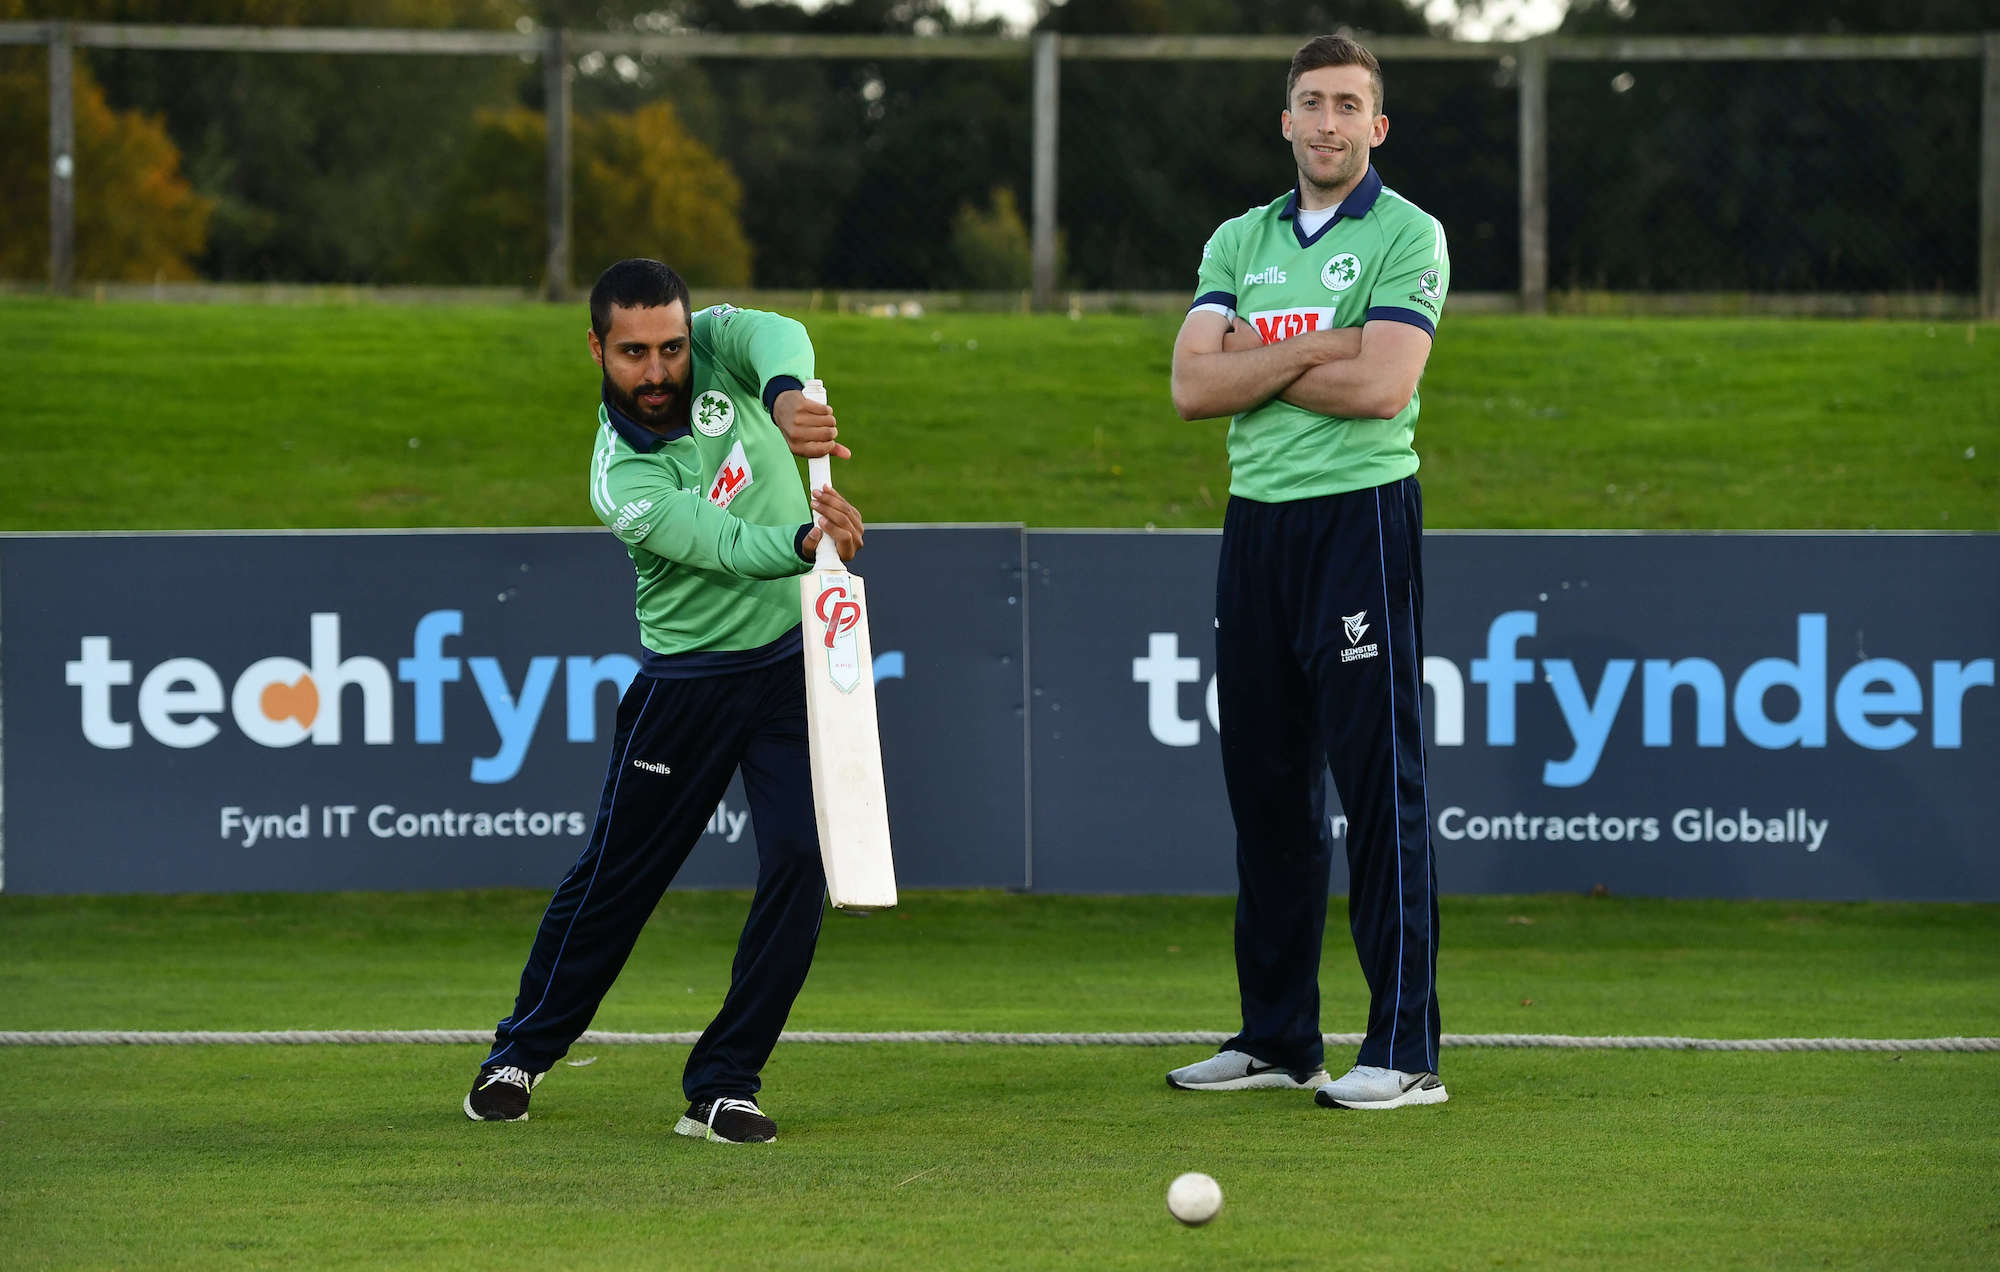 cricket-ireland-techfynder1